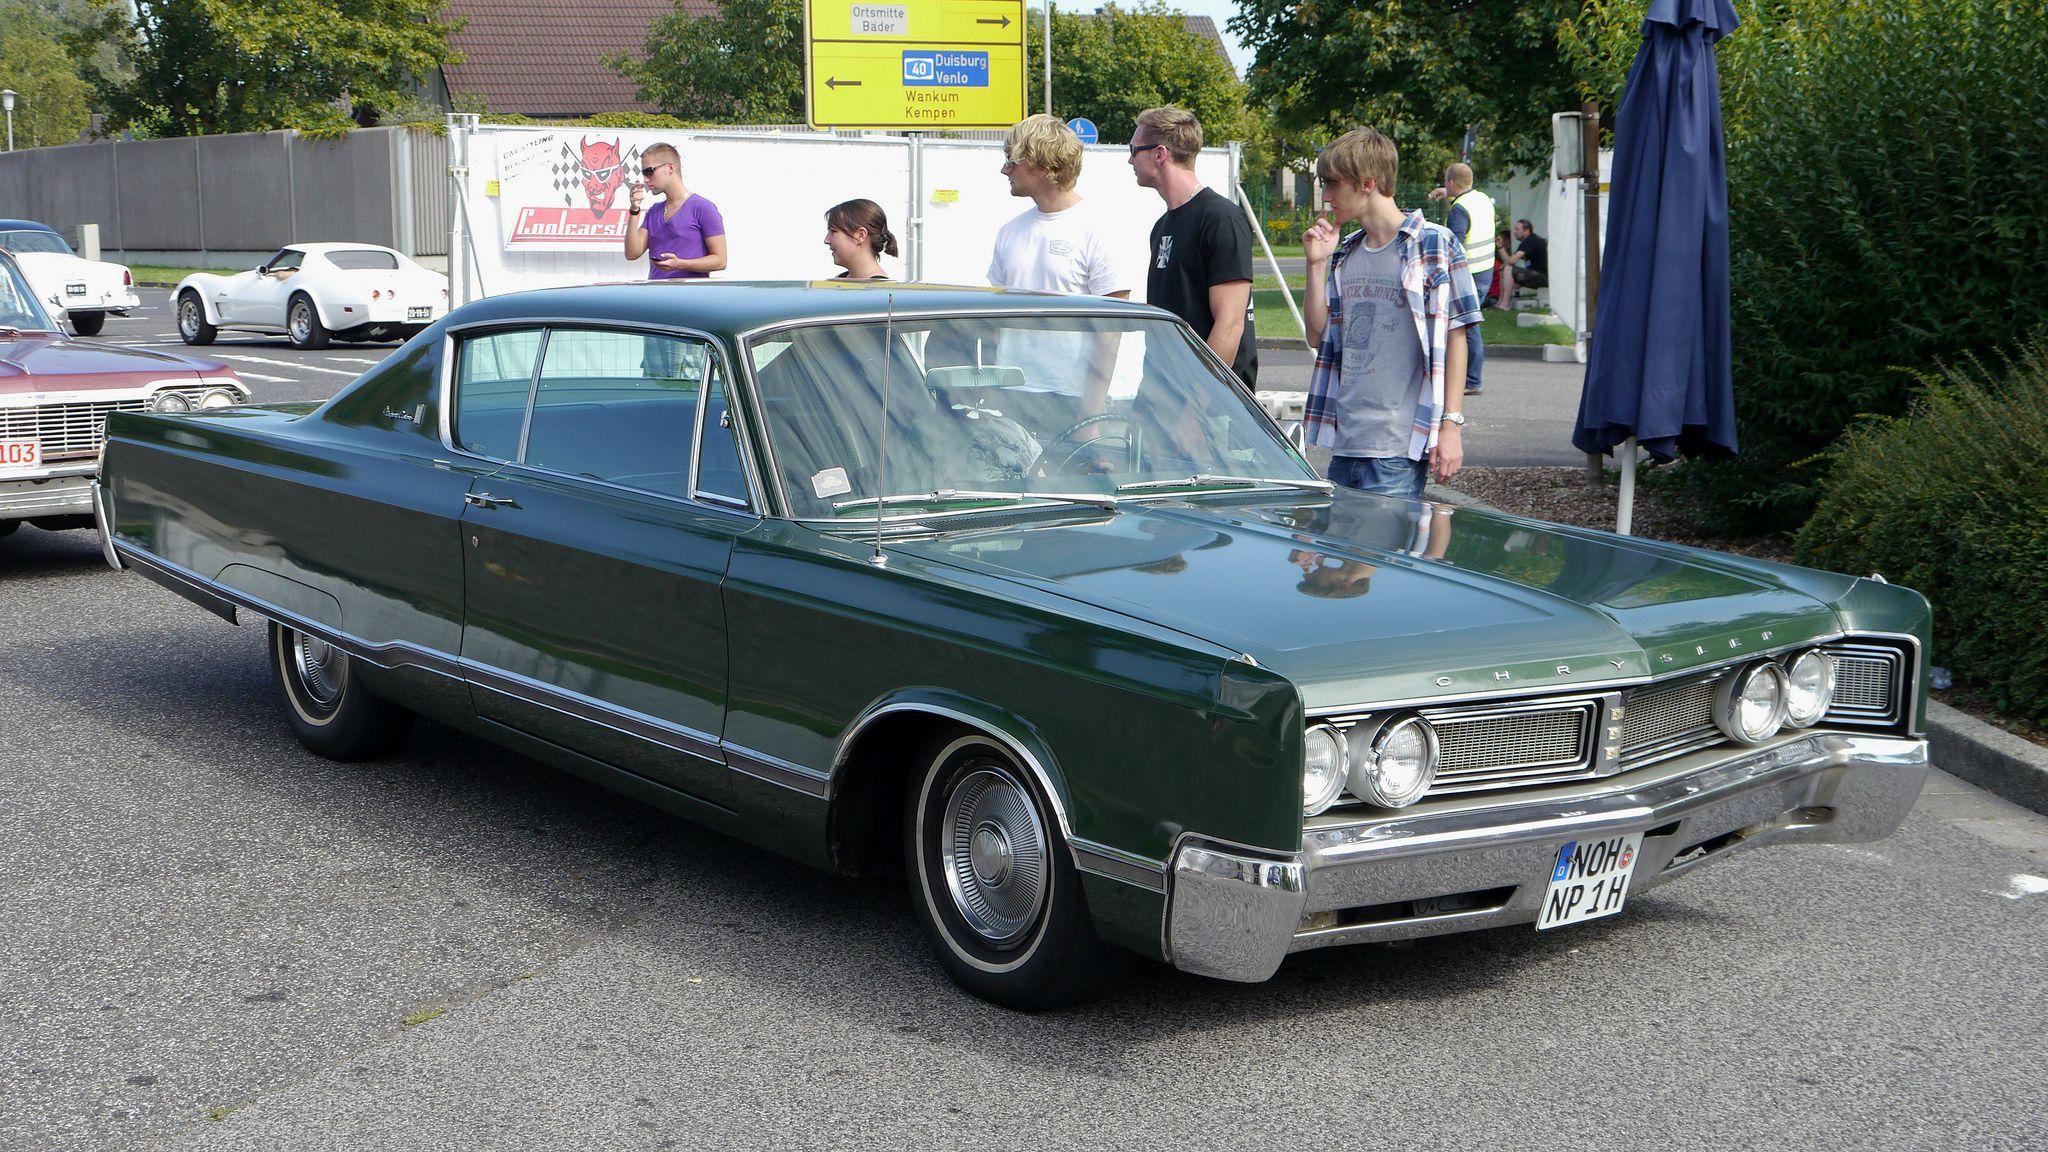 1967 Chrysler Newport Custom 2 Door Hardtop Chrysler Chrysler